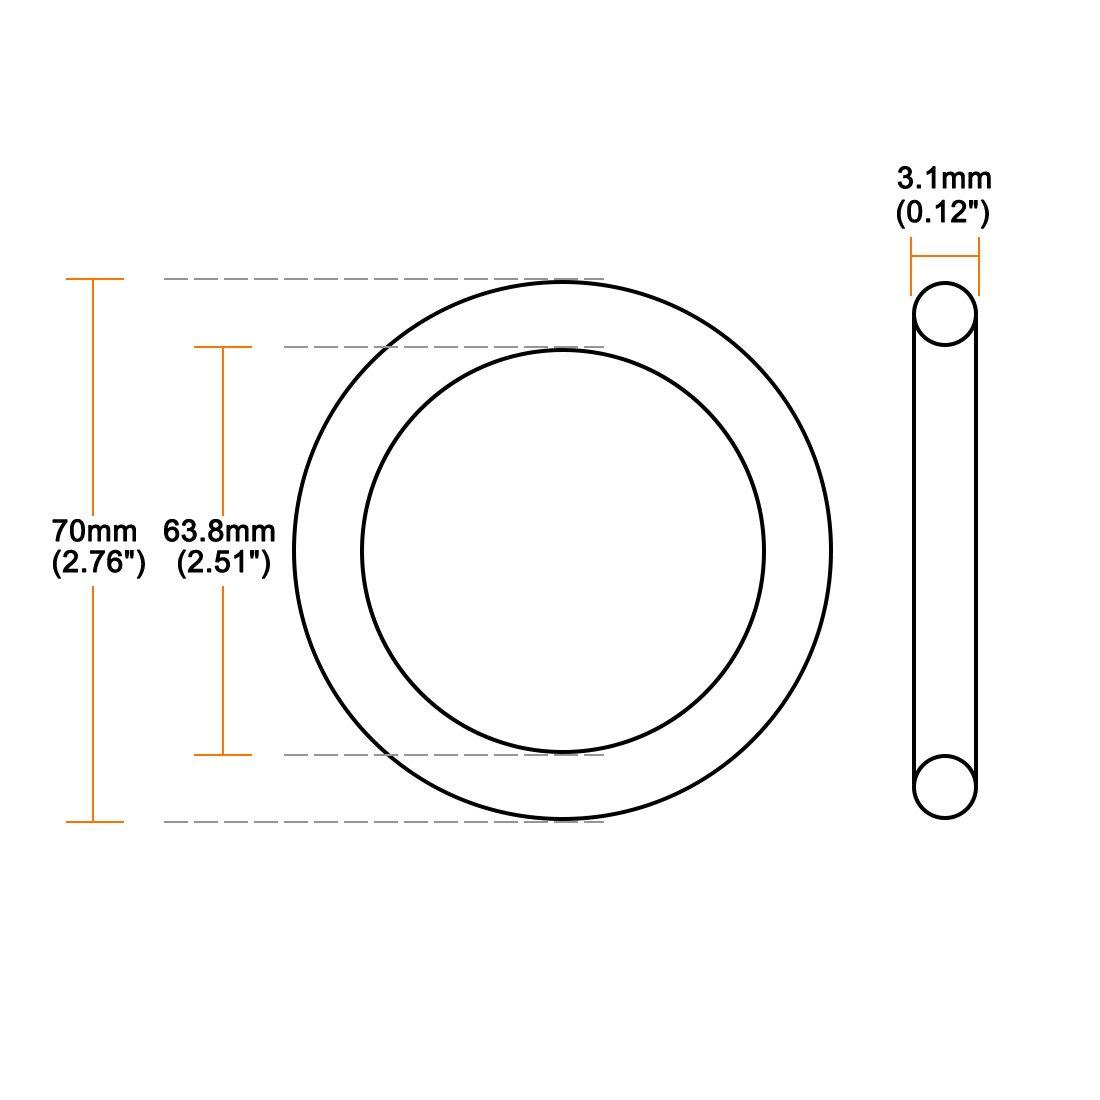 sourcing map 1pcs Silikon O-Ring VMQ Siegel Rings Dichtung Rot 120mmx113,8mmx3,1mm DE de